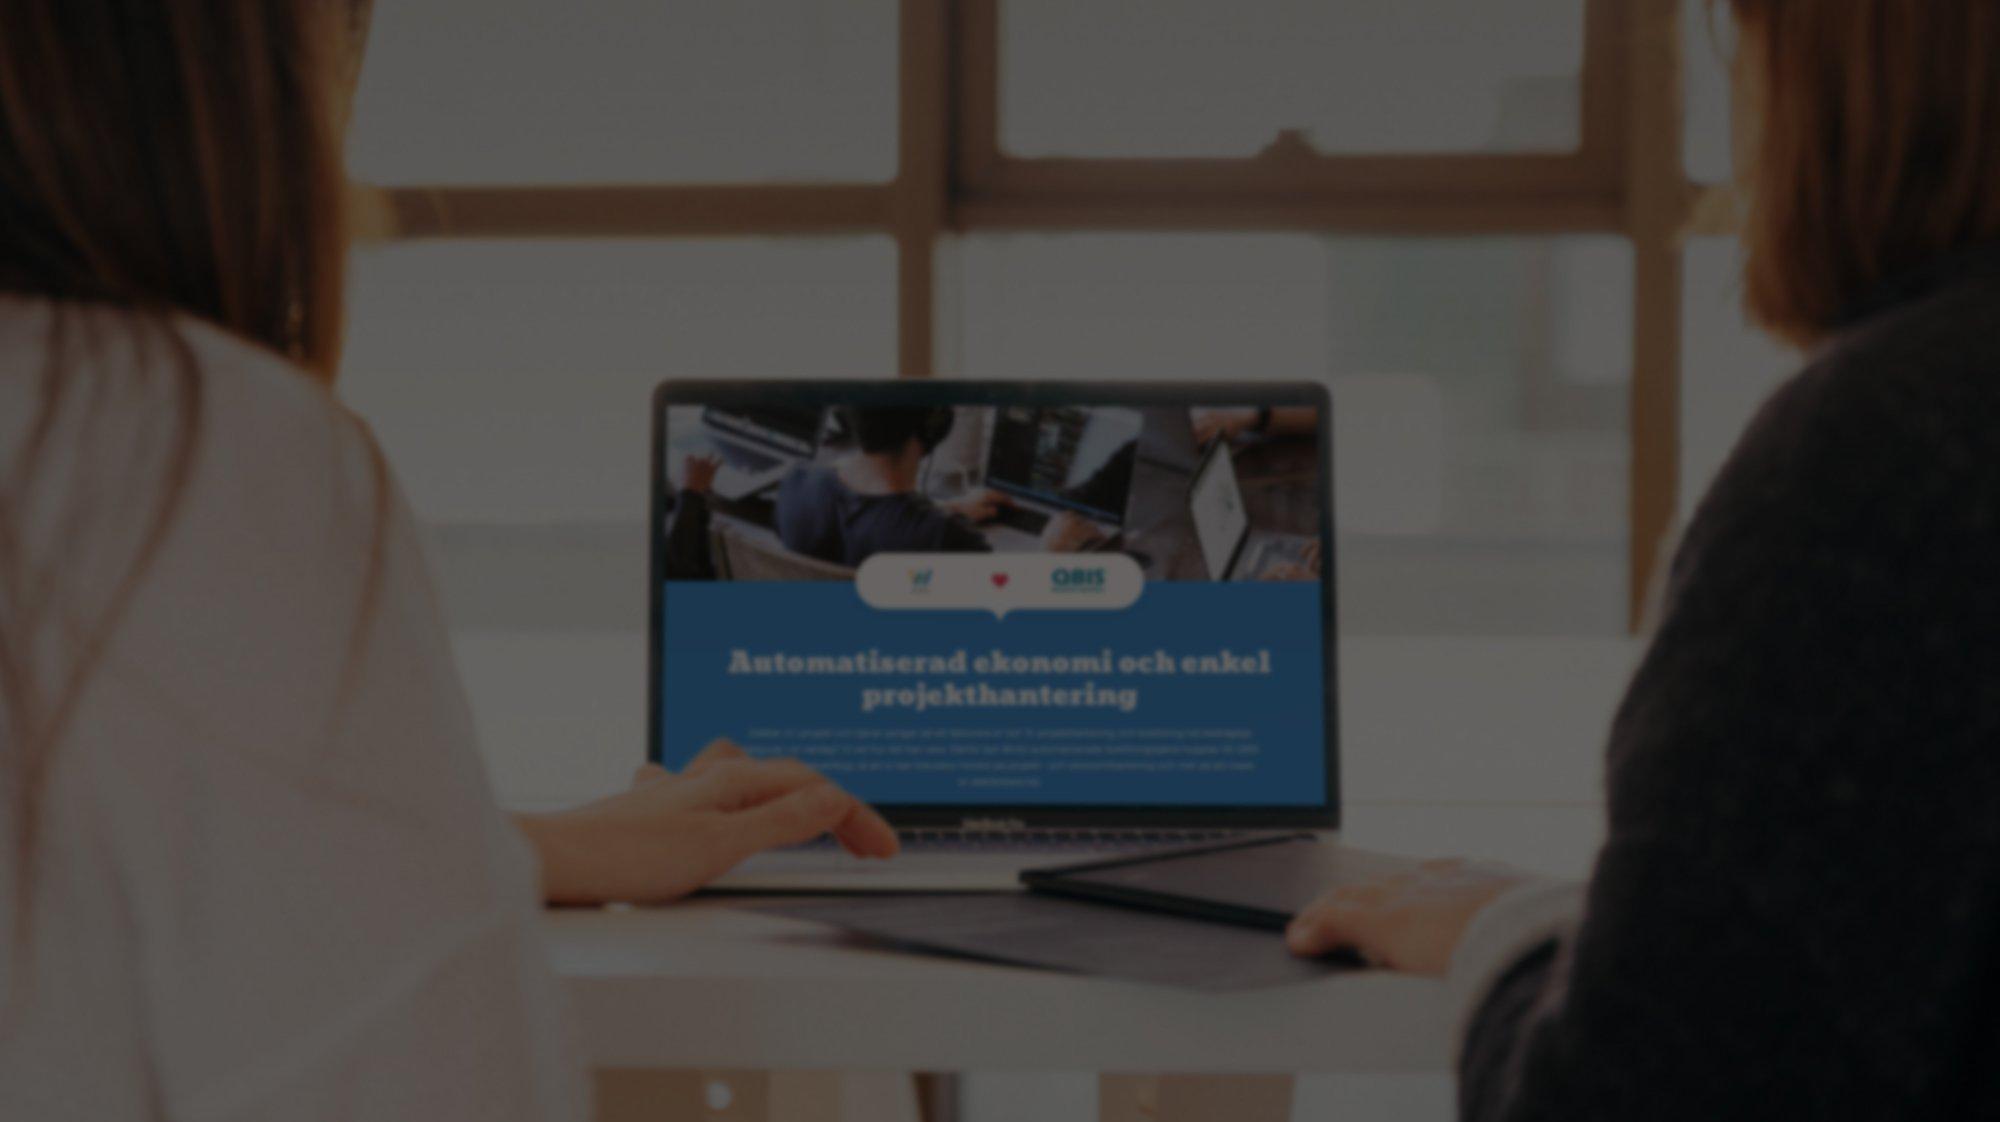 QBIS inleder samarbete med Wint